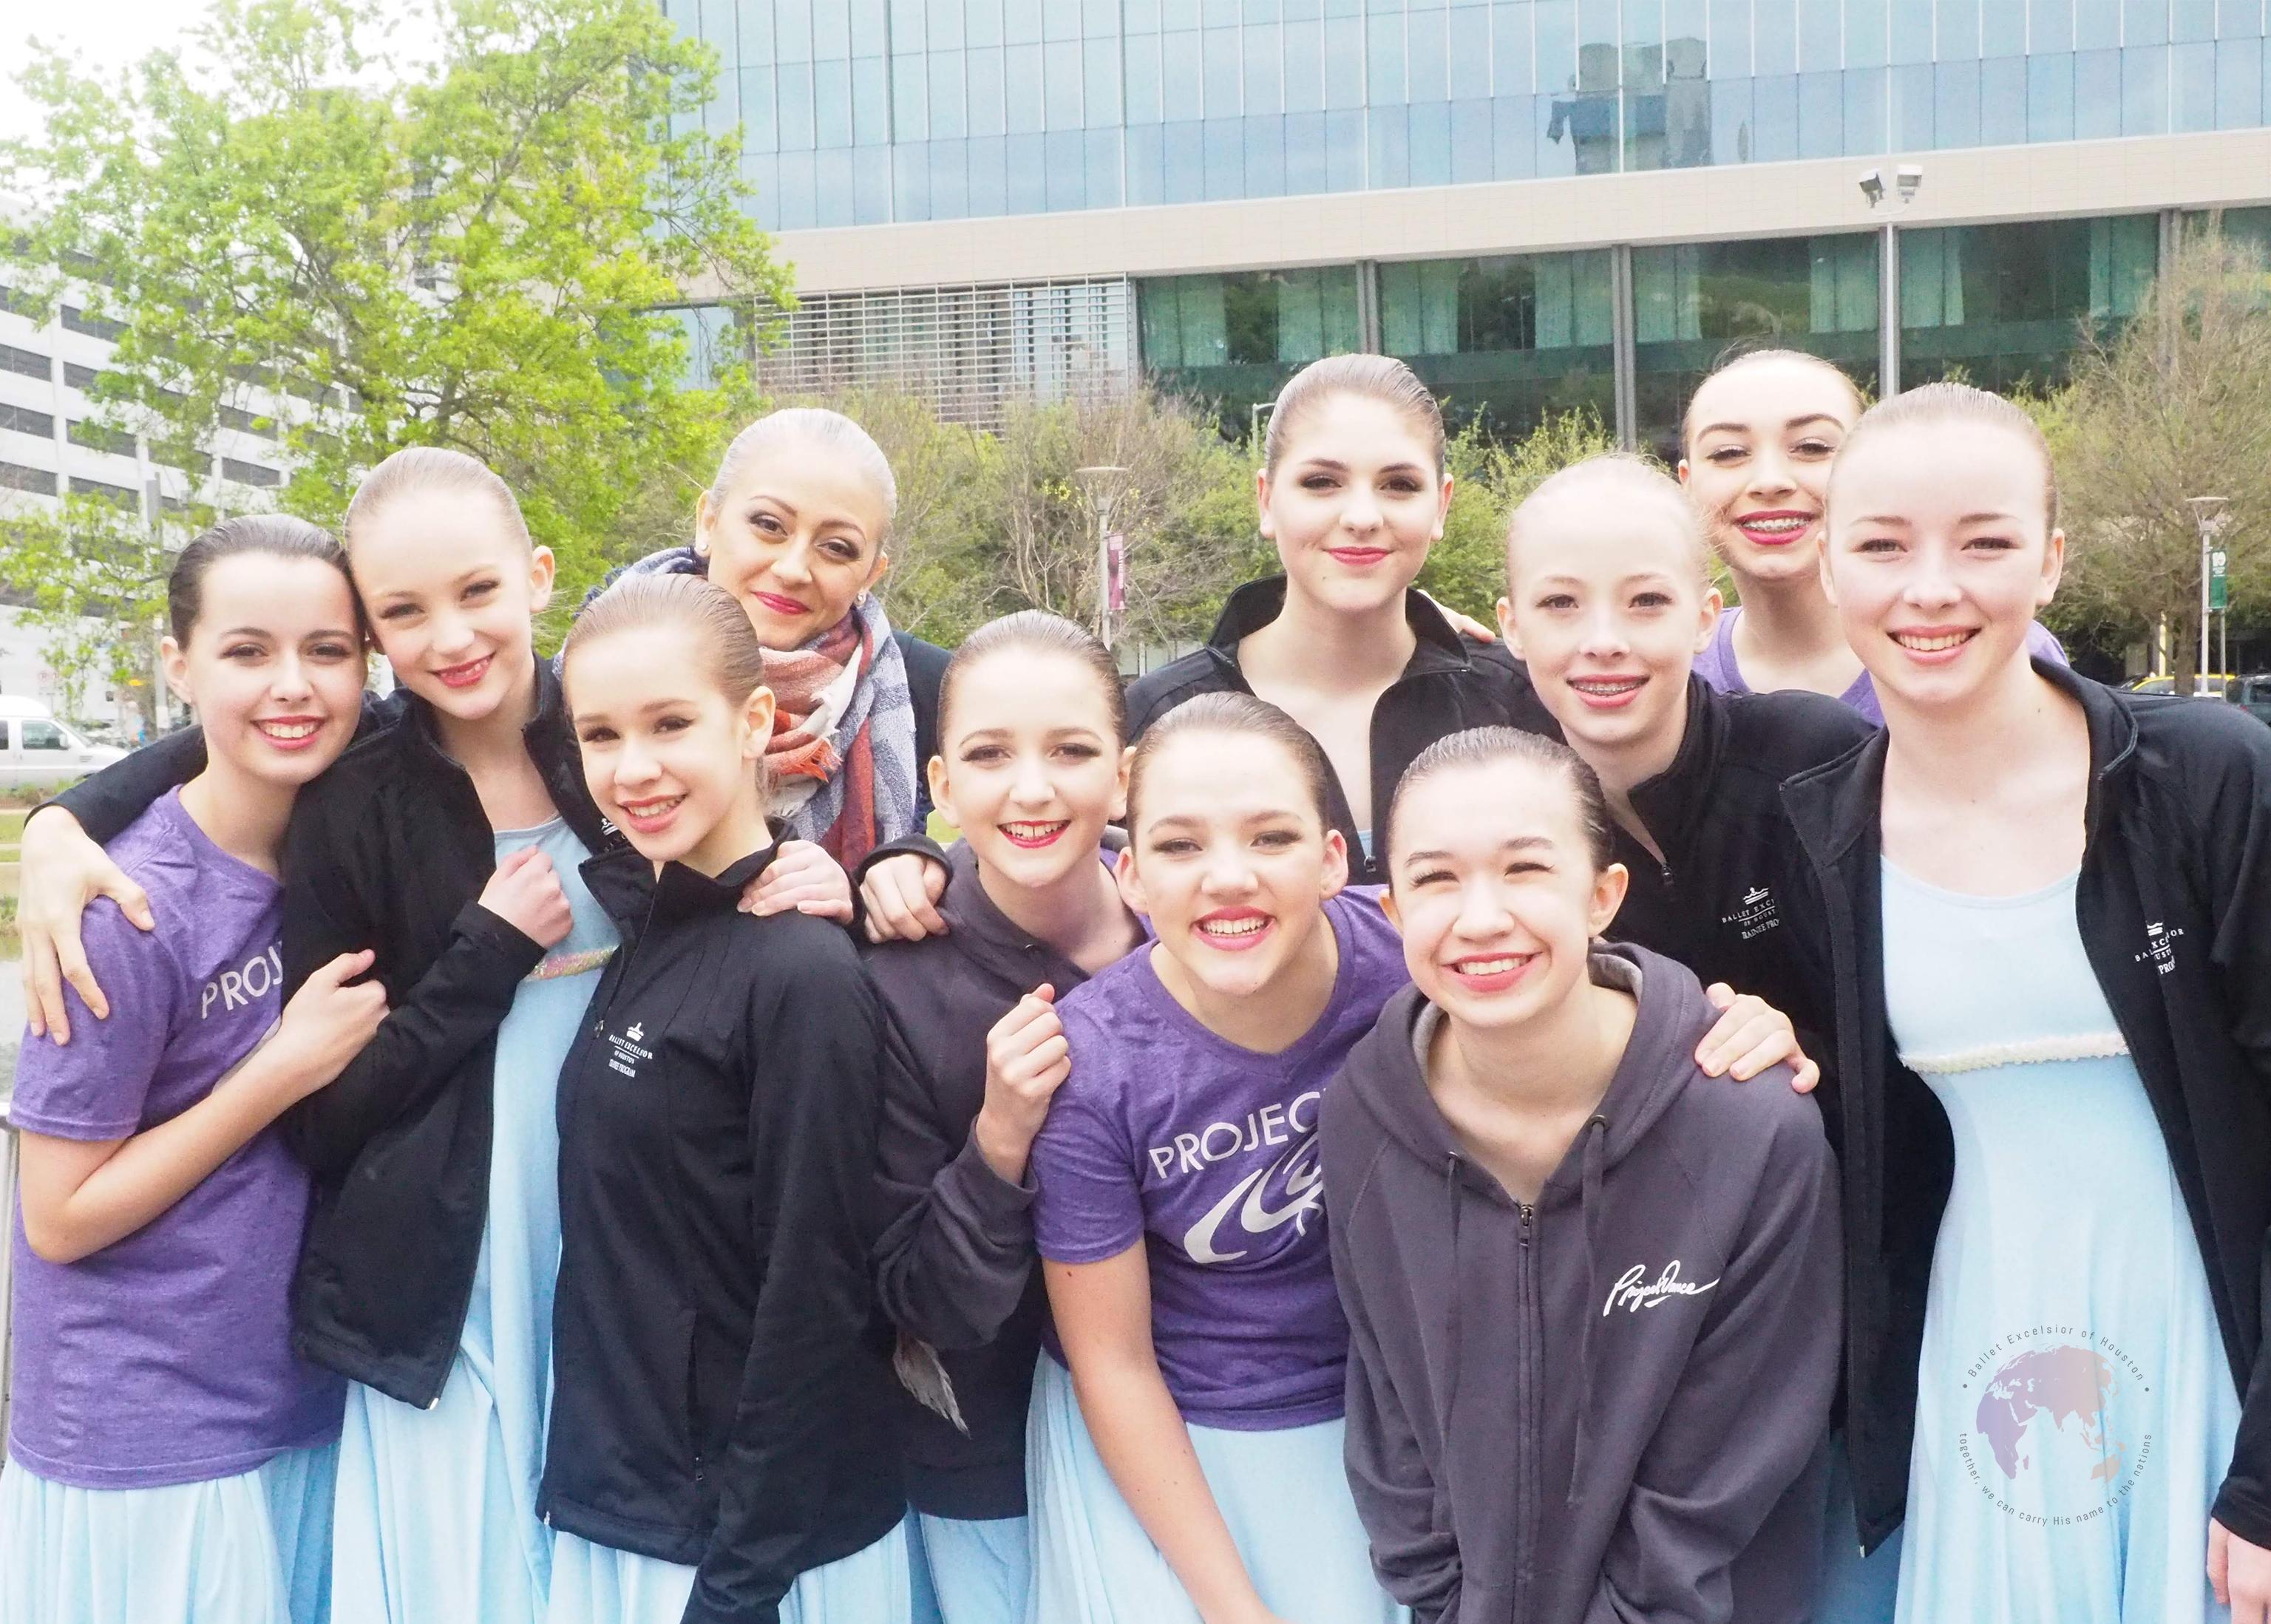 Ballet Excelsior Trainees Dancers at Project Dance Houston